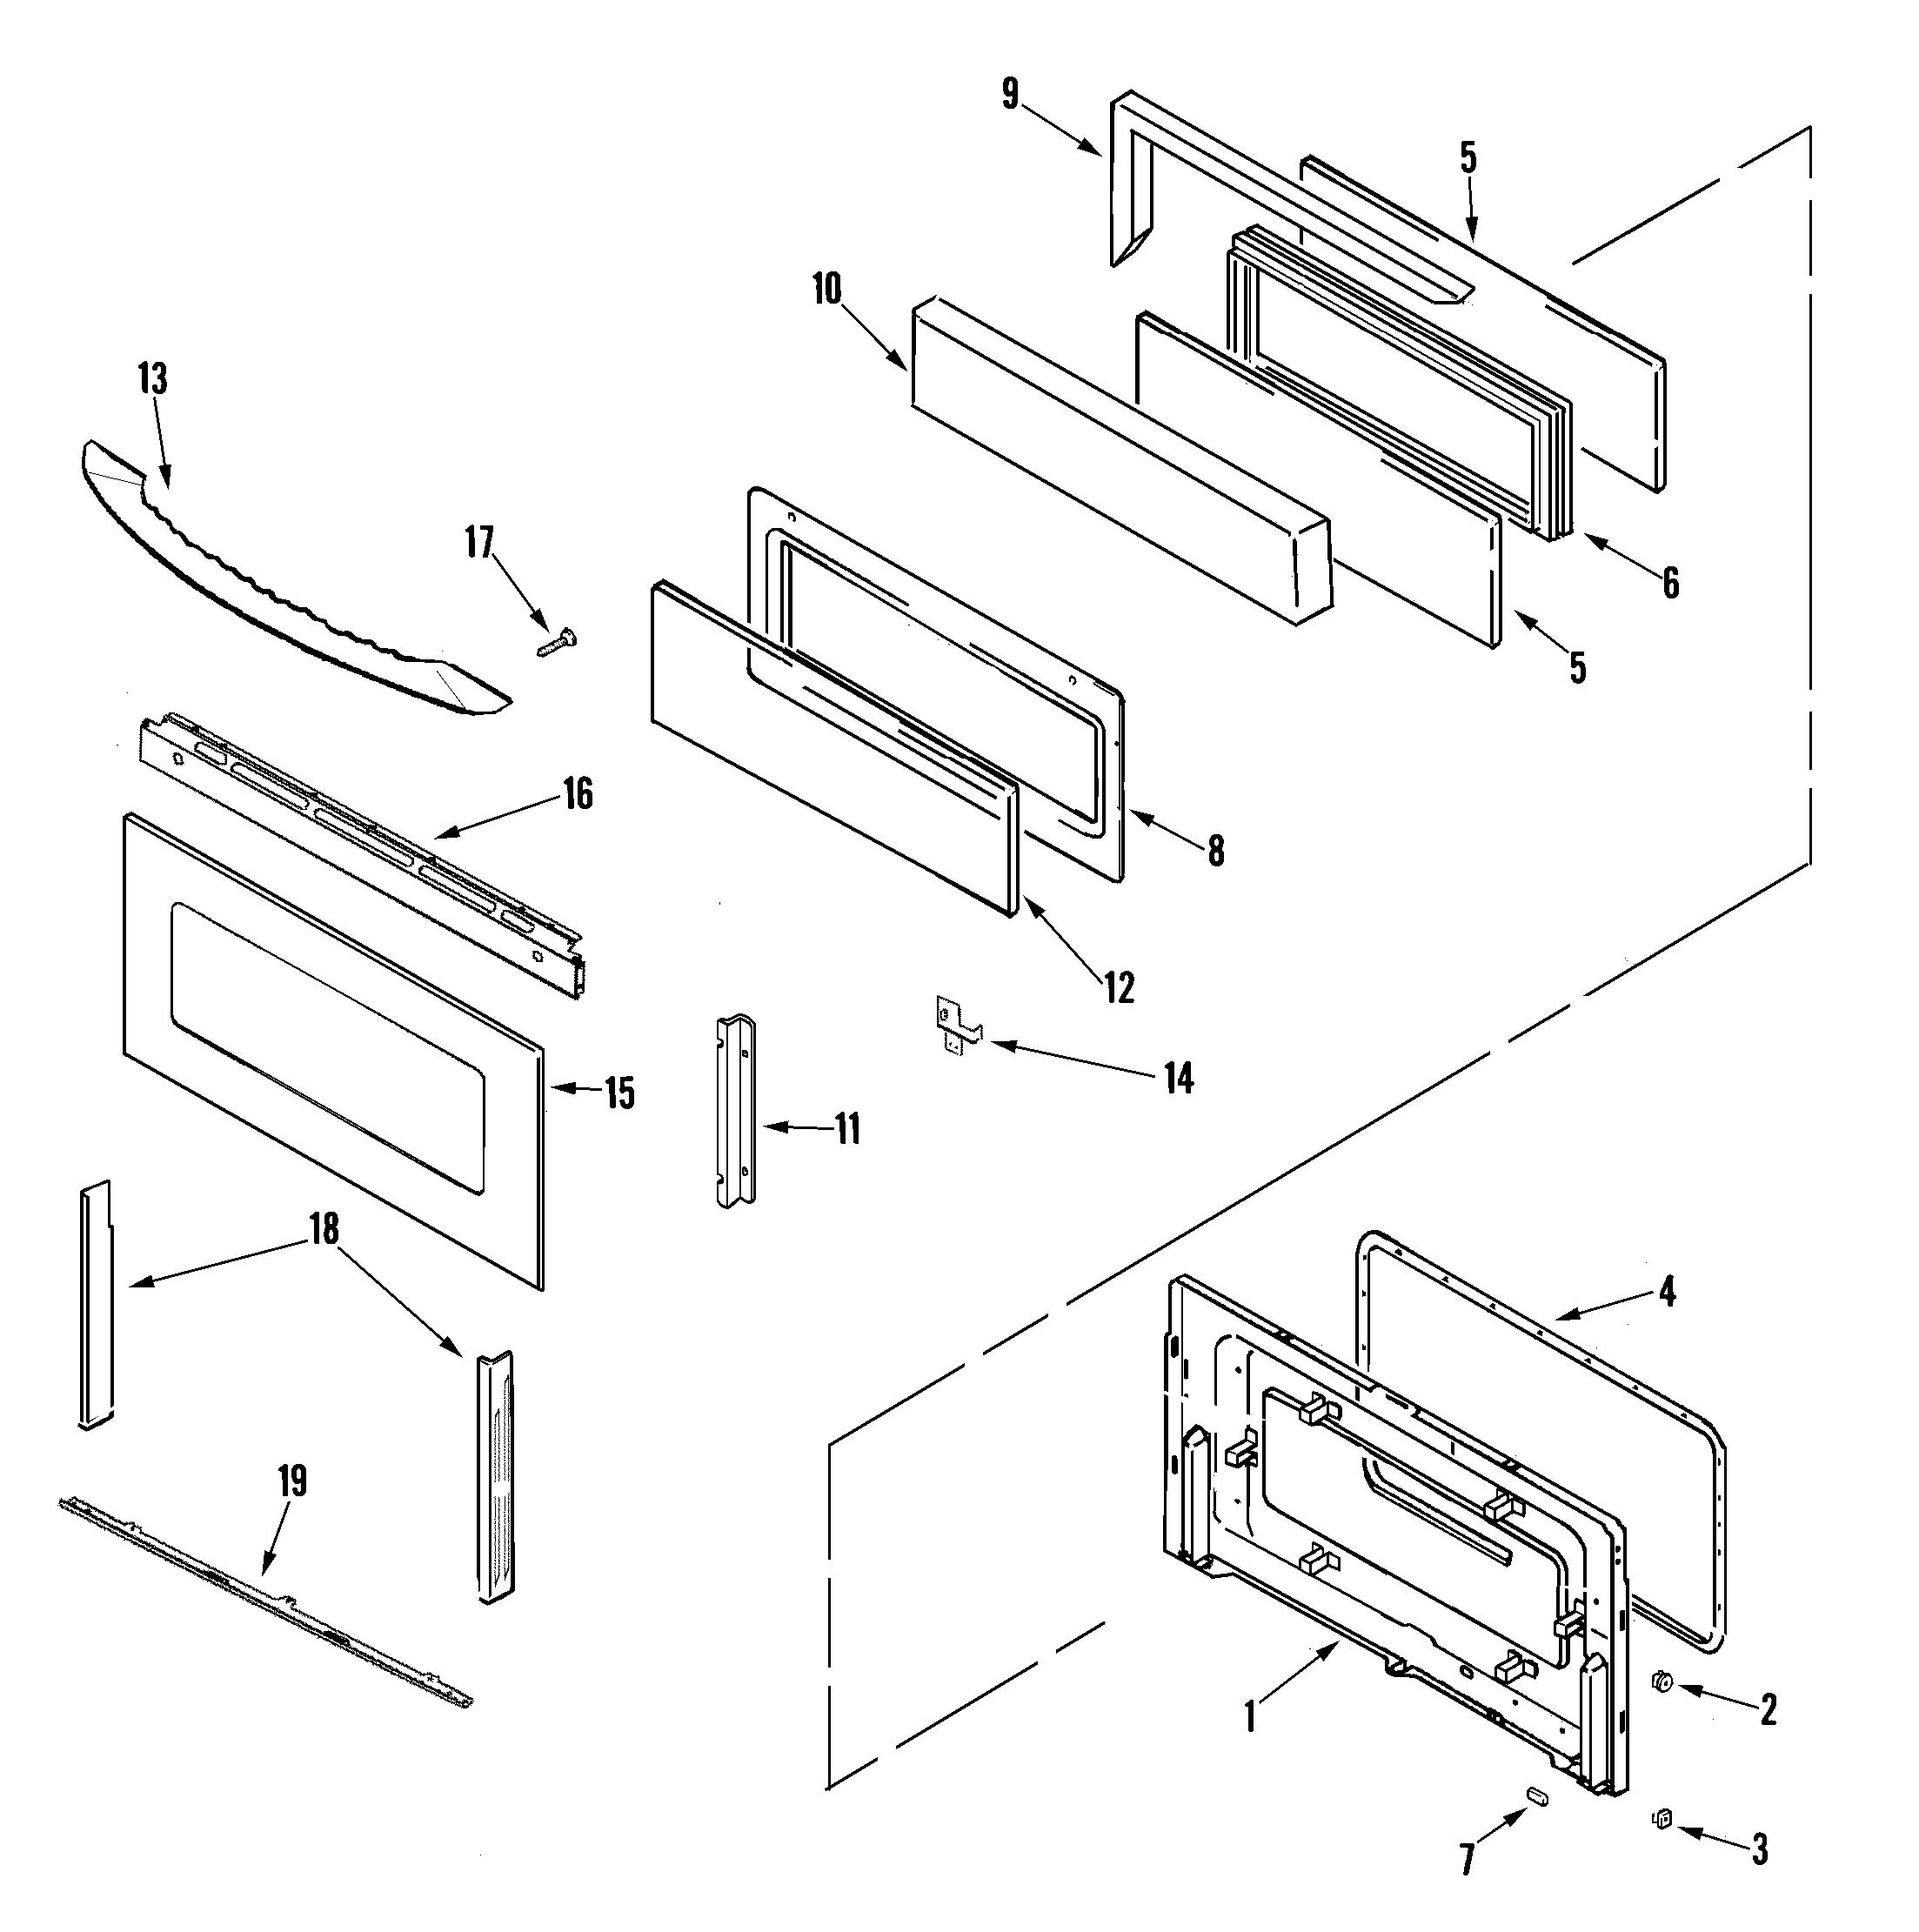 double door parts diagram wiring motorcycle alarm maytag mgr6875adb gemini 30 quot oven freestanding gas